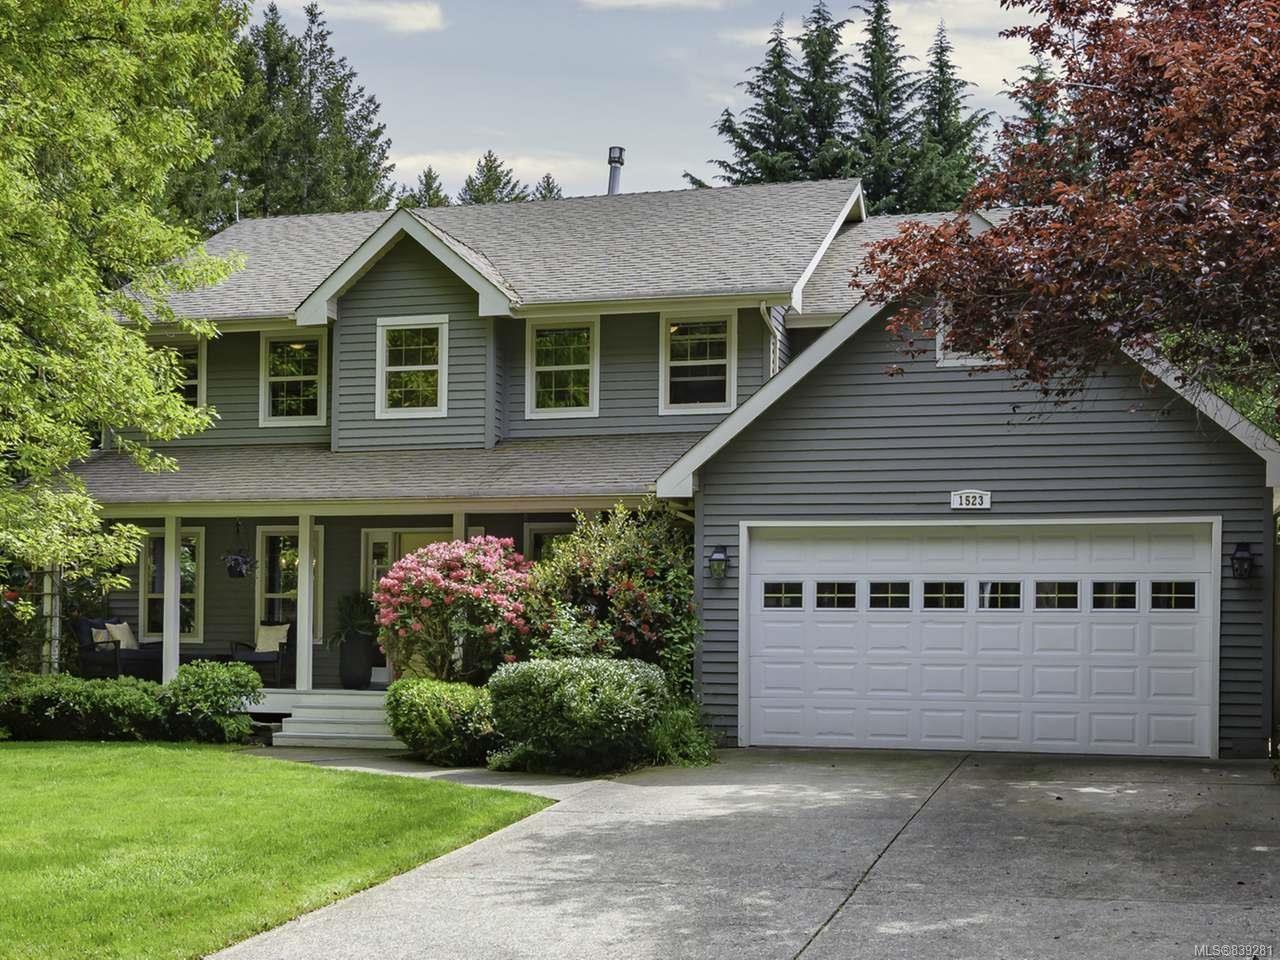 Main Photo: 1523 Eton Rd in COMOX: CV Comox (Town of) House for sale (Comox Valley)  : MLS®# 839281